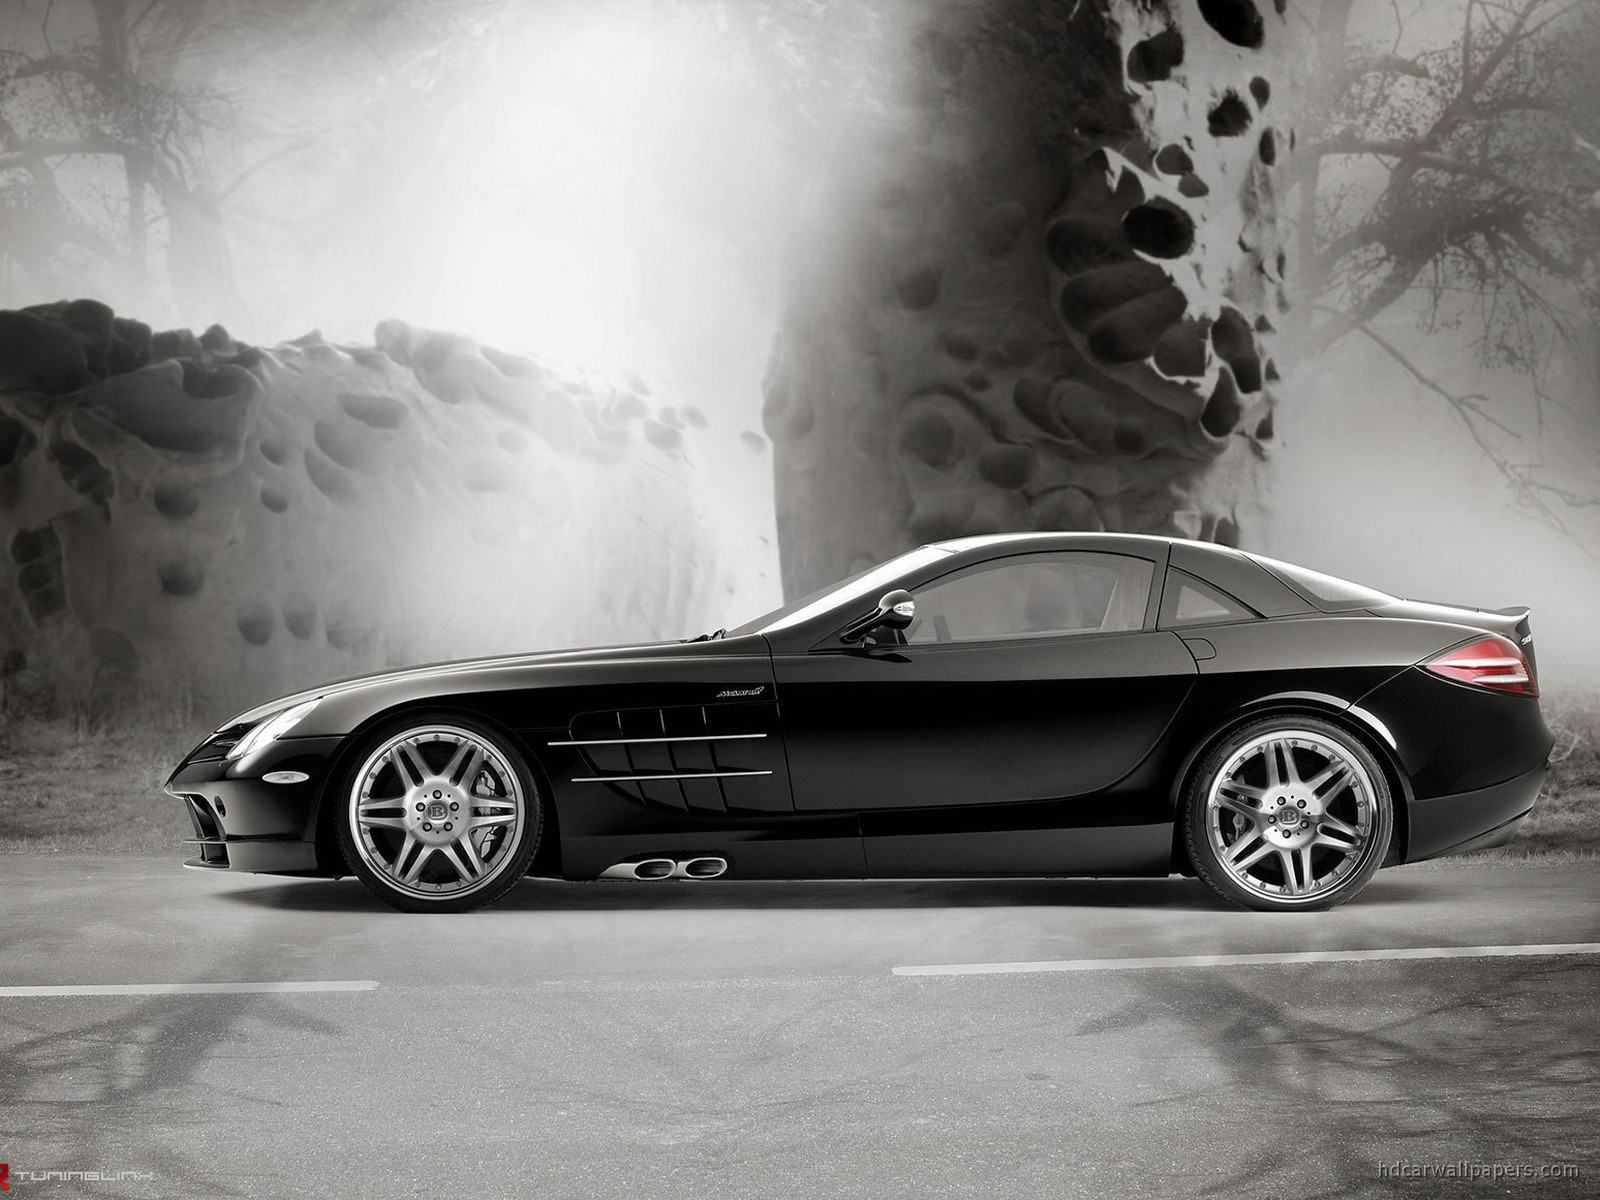 Brabus Mercedes Benz Slr Mclaren Wallpaper Hd Car Wallpapers Id